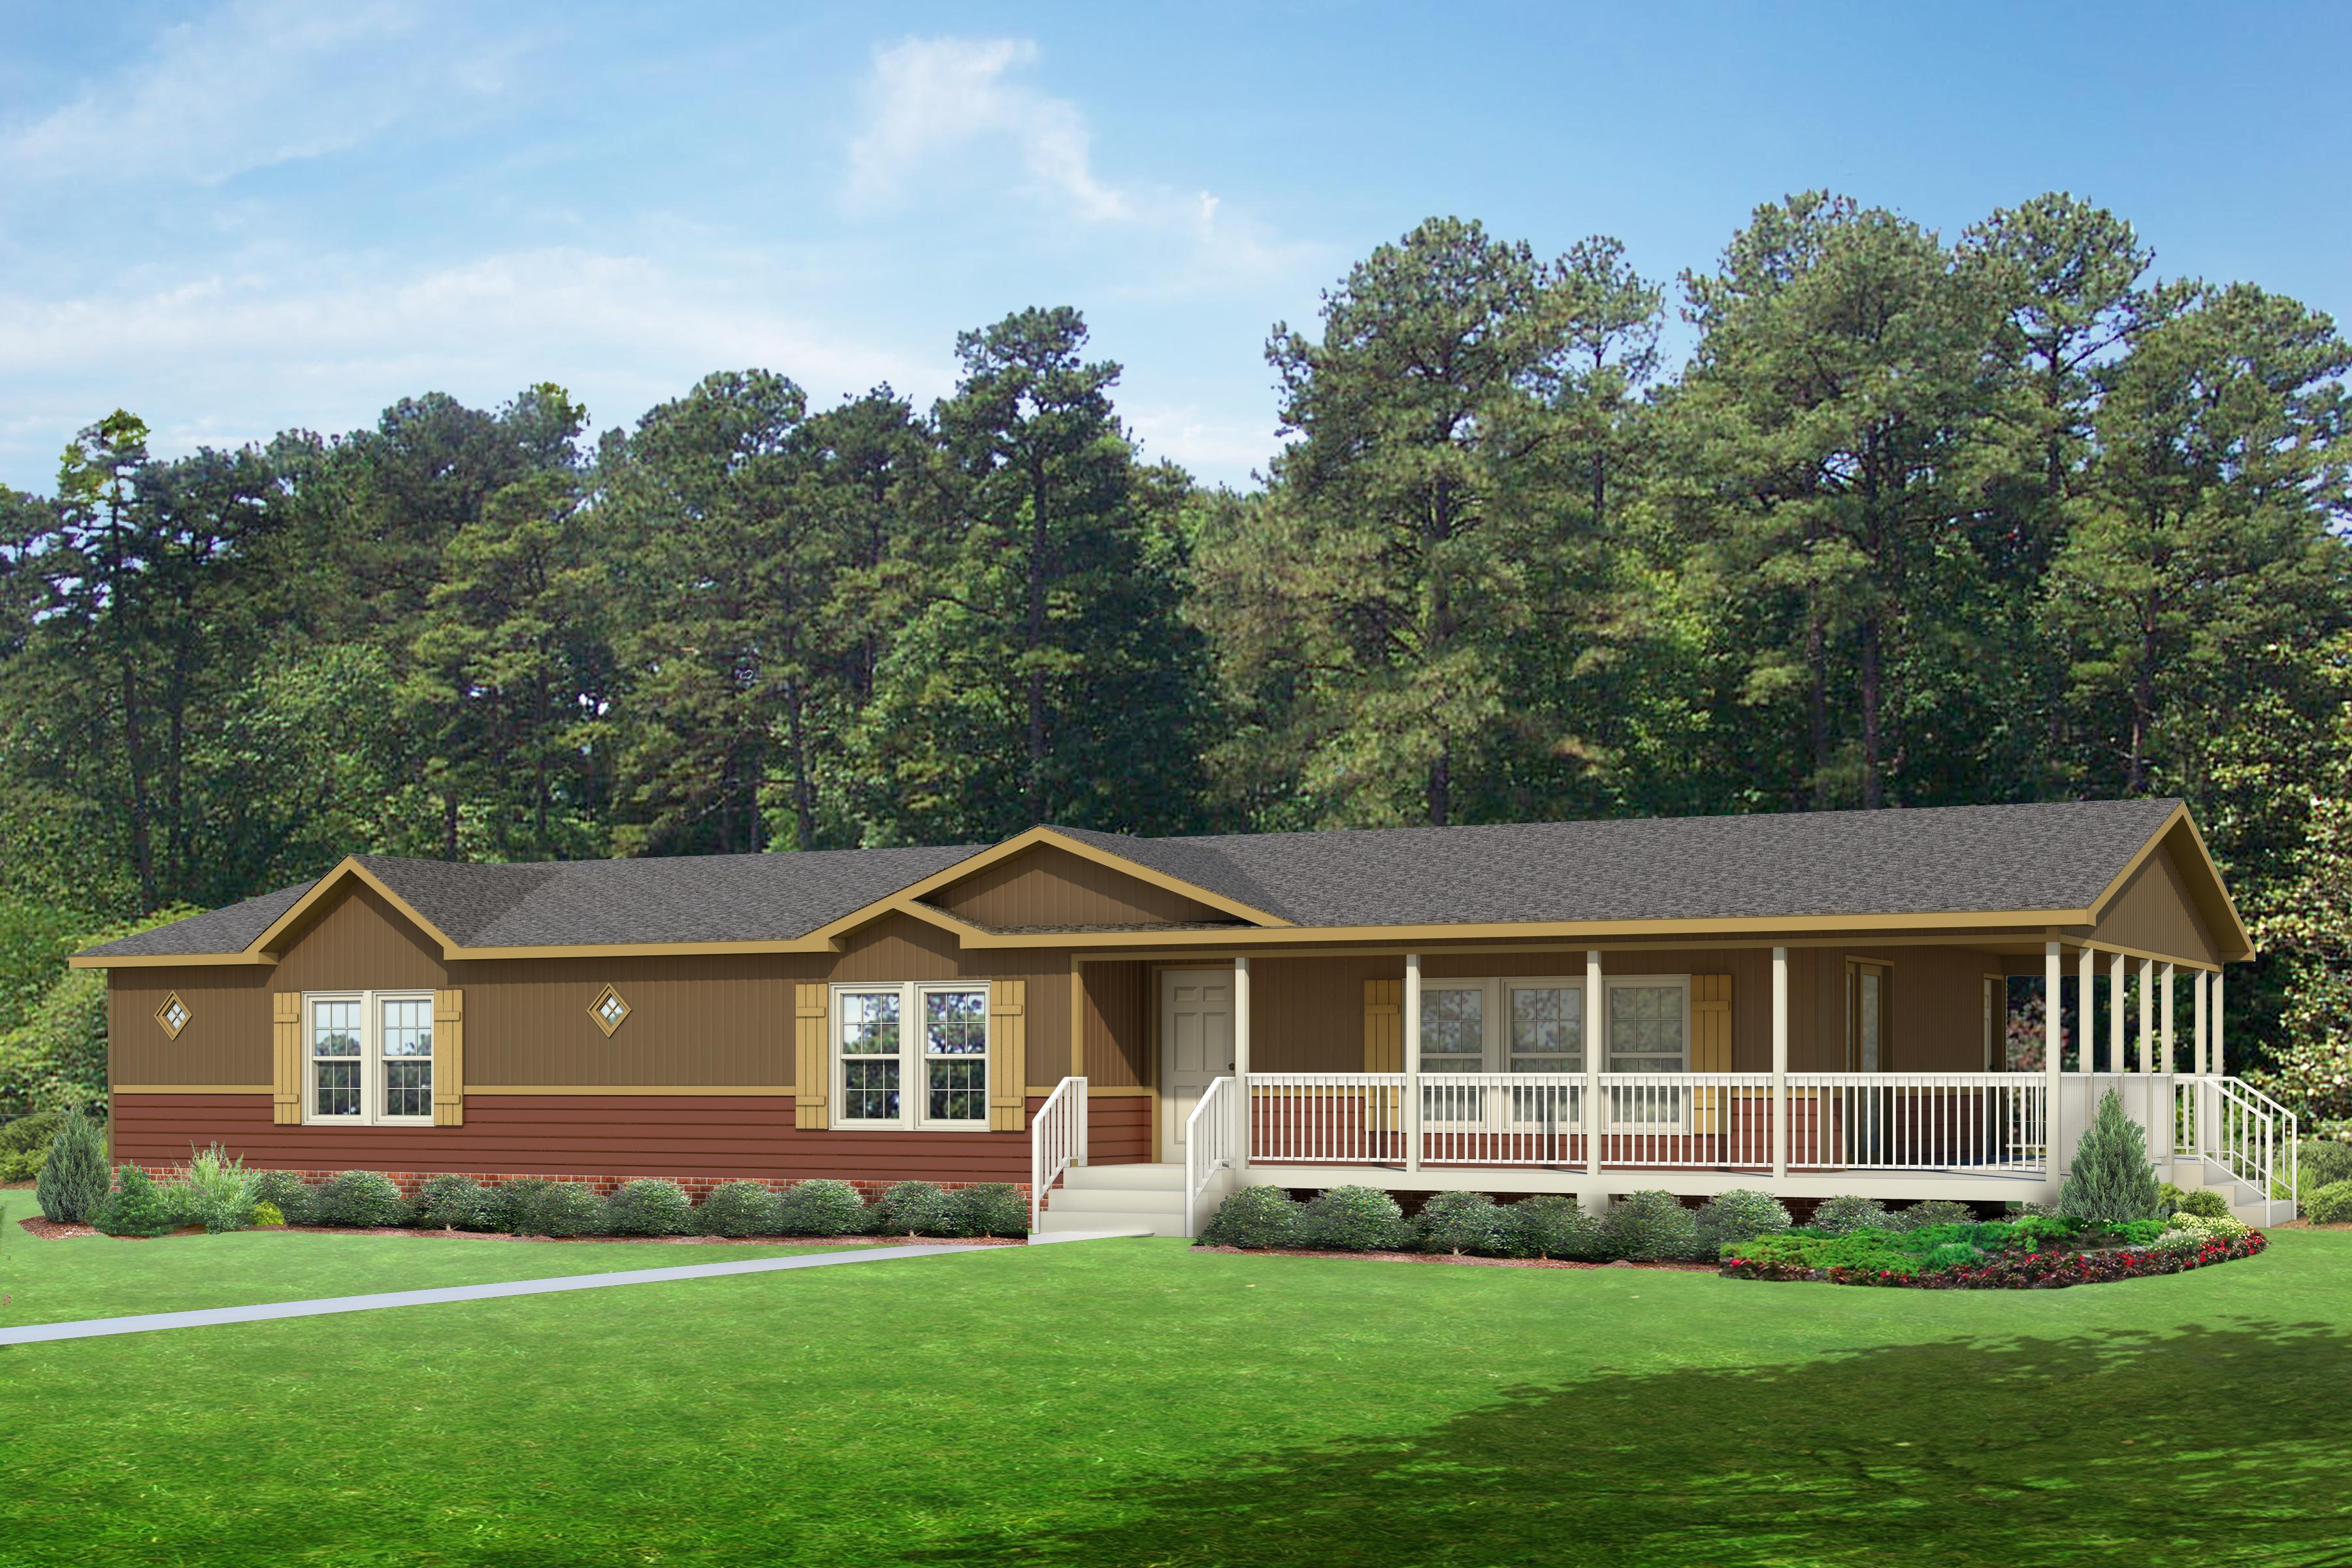 Clayton Homes In Waco Tx Prefabricated Modular